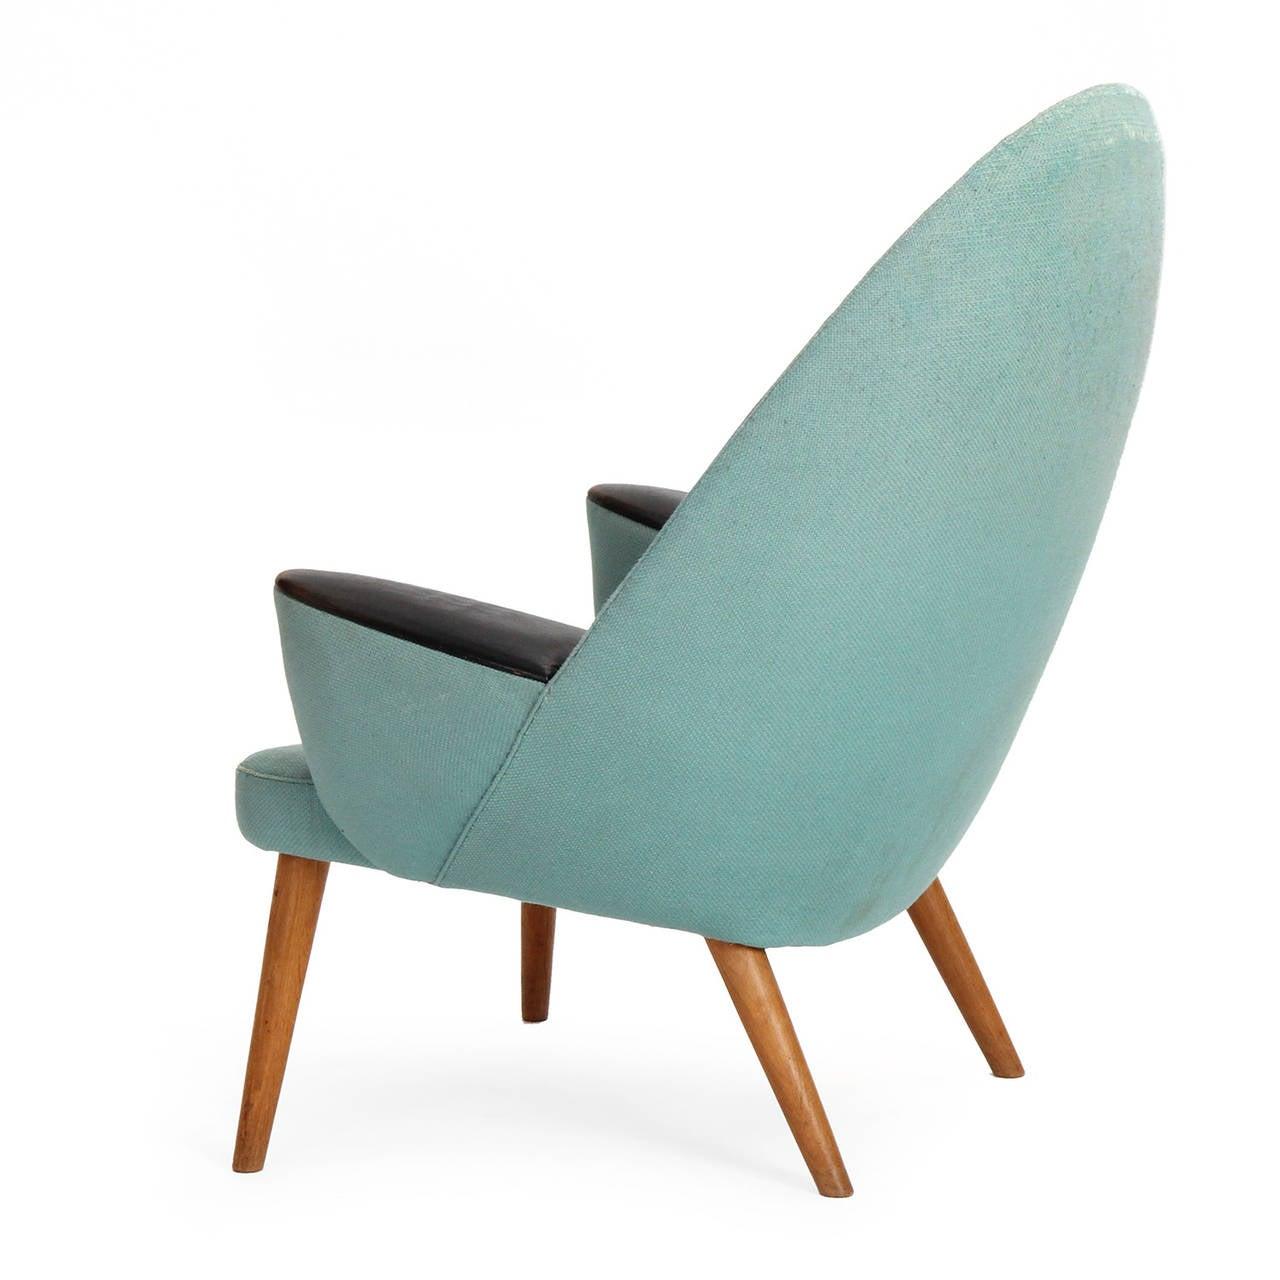 Upholstered peacock chair by hans j wegner for sale at for Hans wegner queen chair